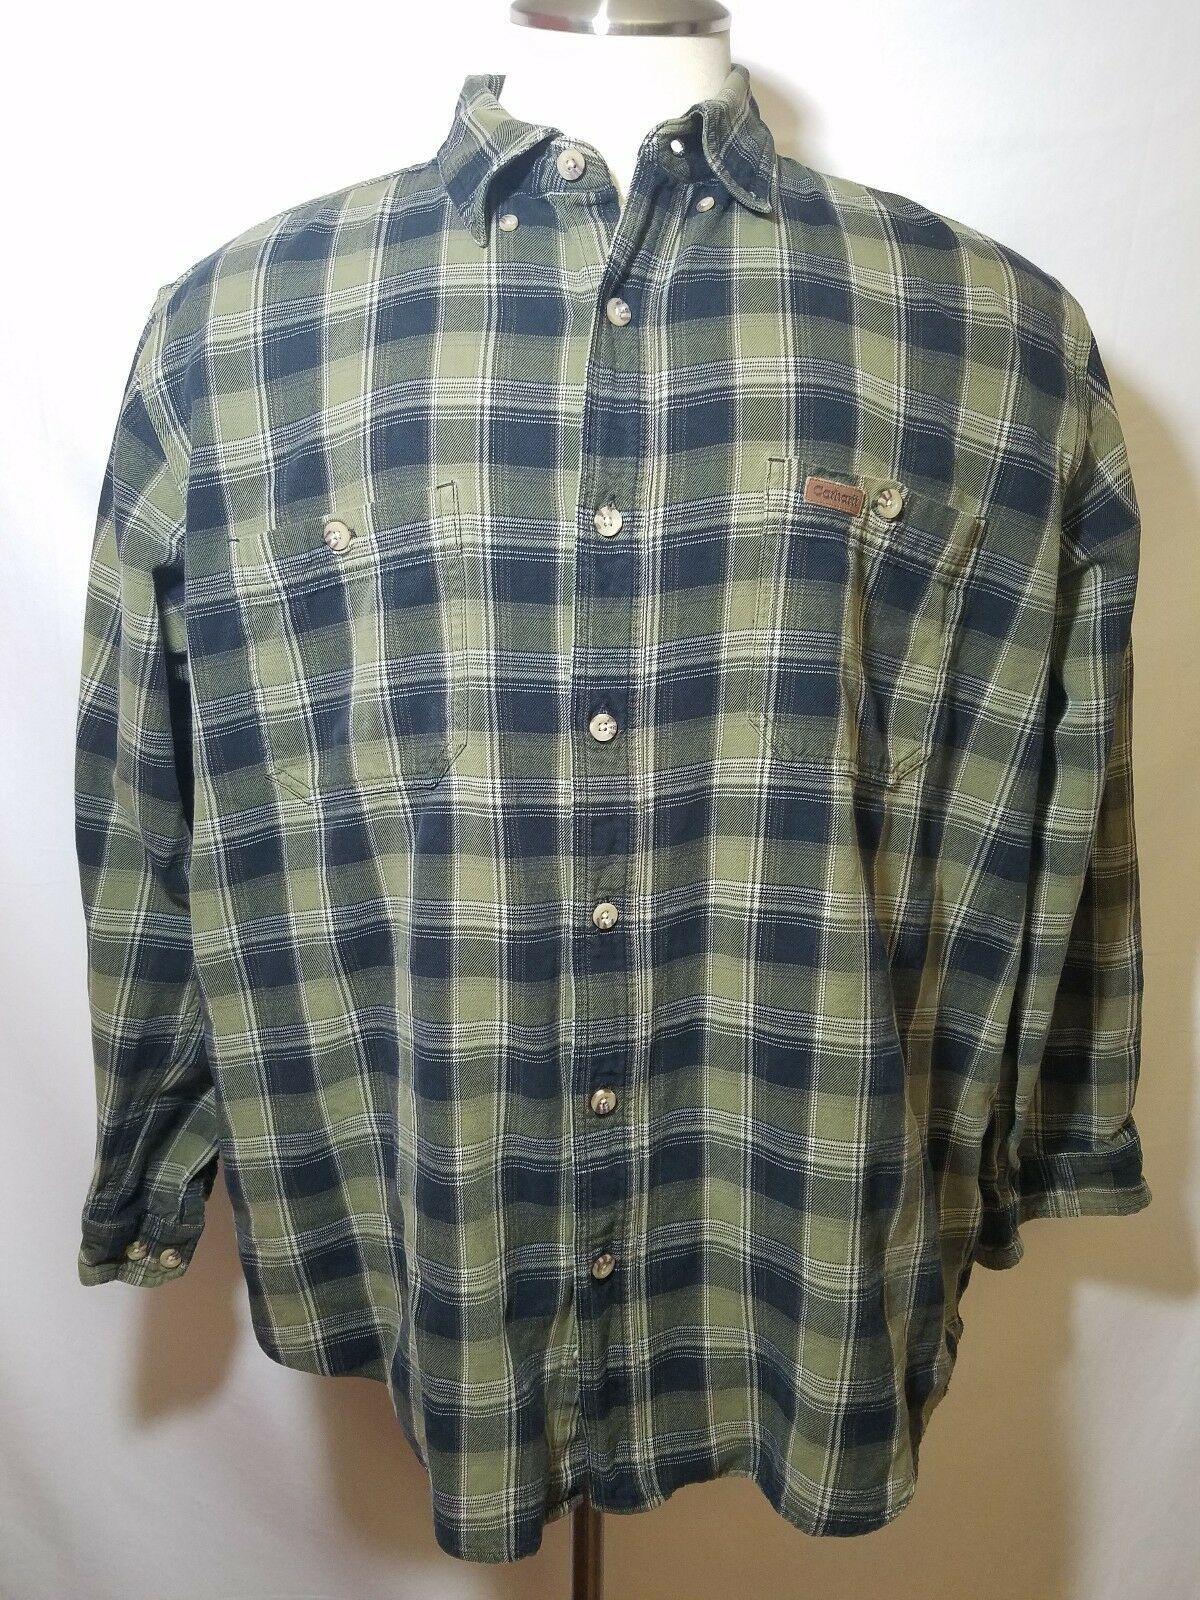 Carhartt Mens Black Green Plaid Button Up Long Sleeve Shirt Size Xl 100 Cotton In 2020 Carhartt Shirts Long Sleeve Shirts Shirts